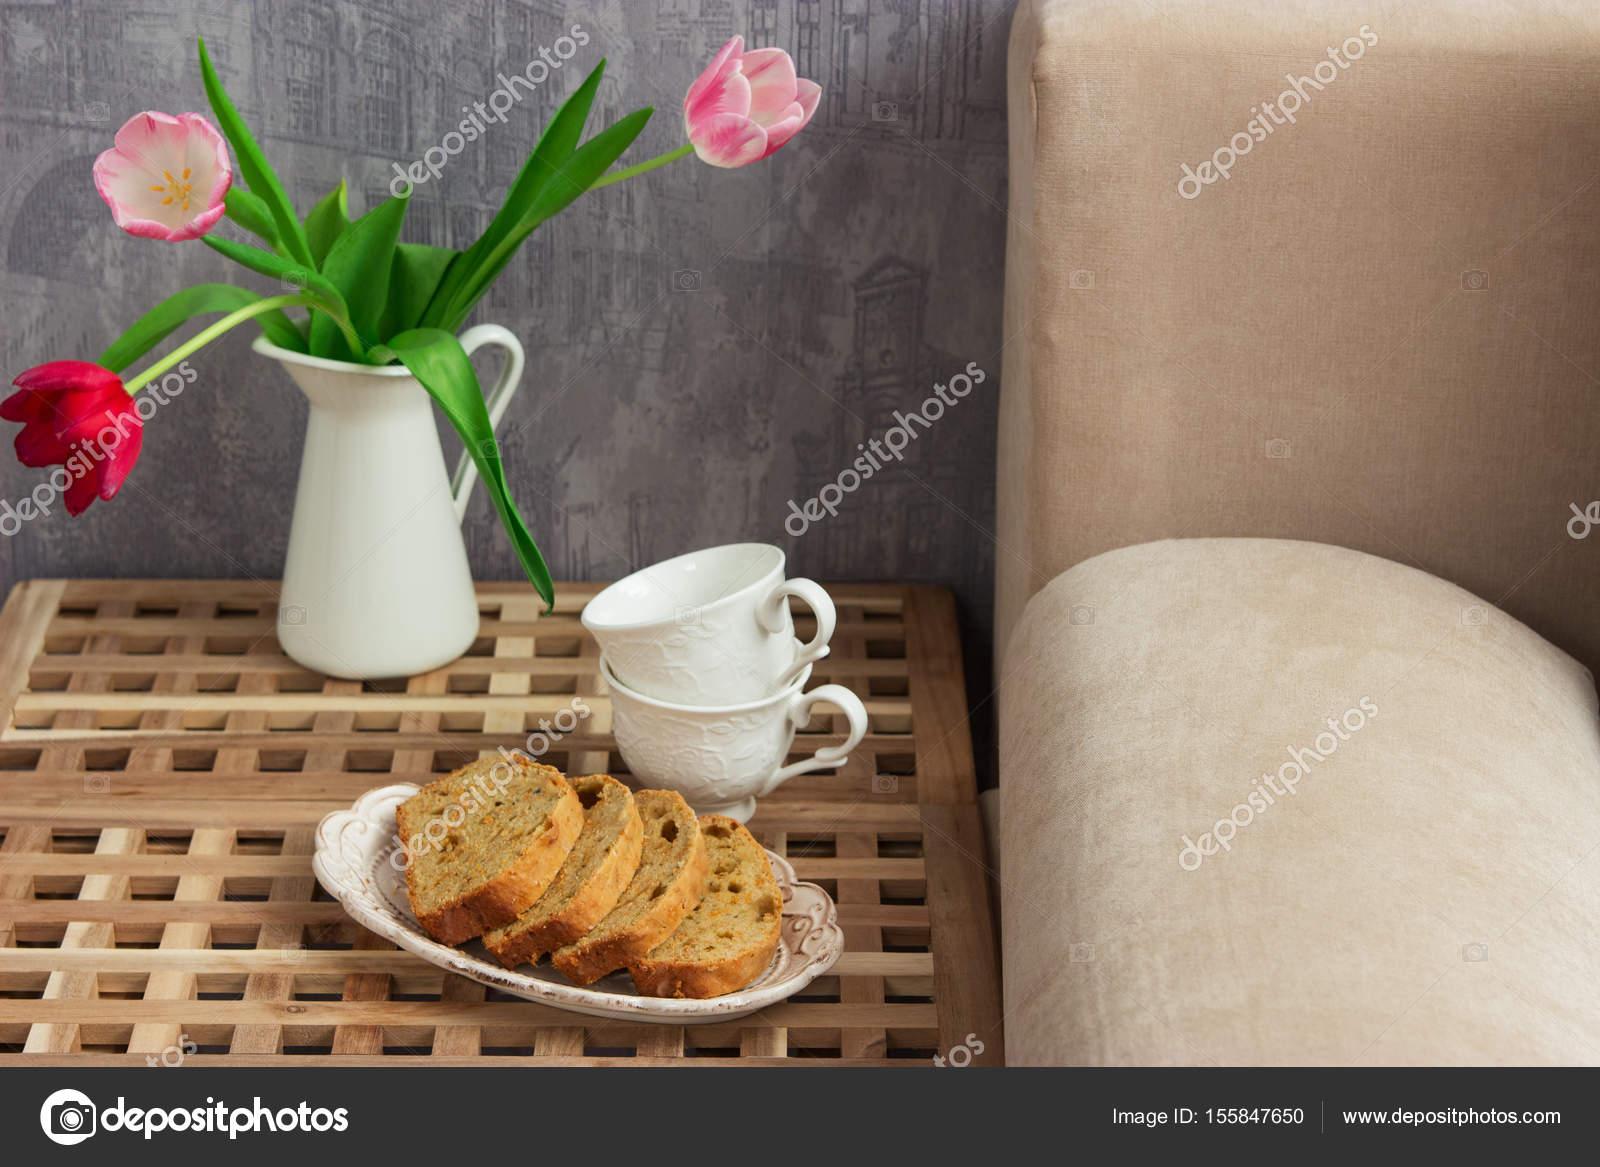 Zitronen Kuchen Tisch Bett — Stockfoto © Spring_melody #155847650